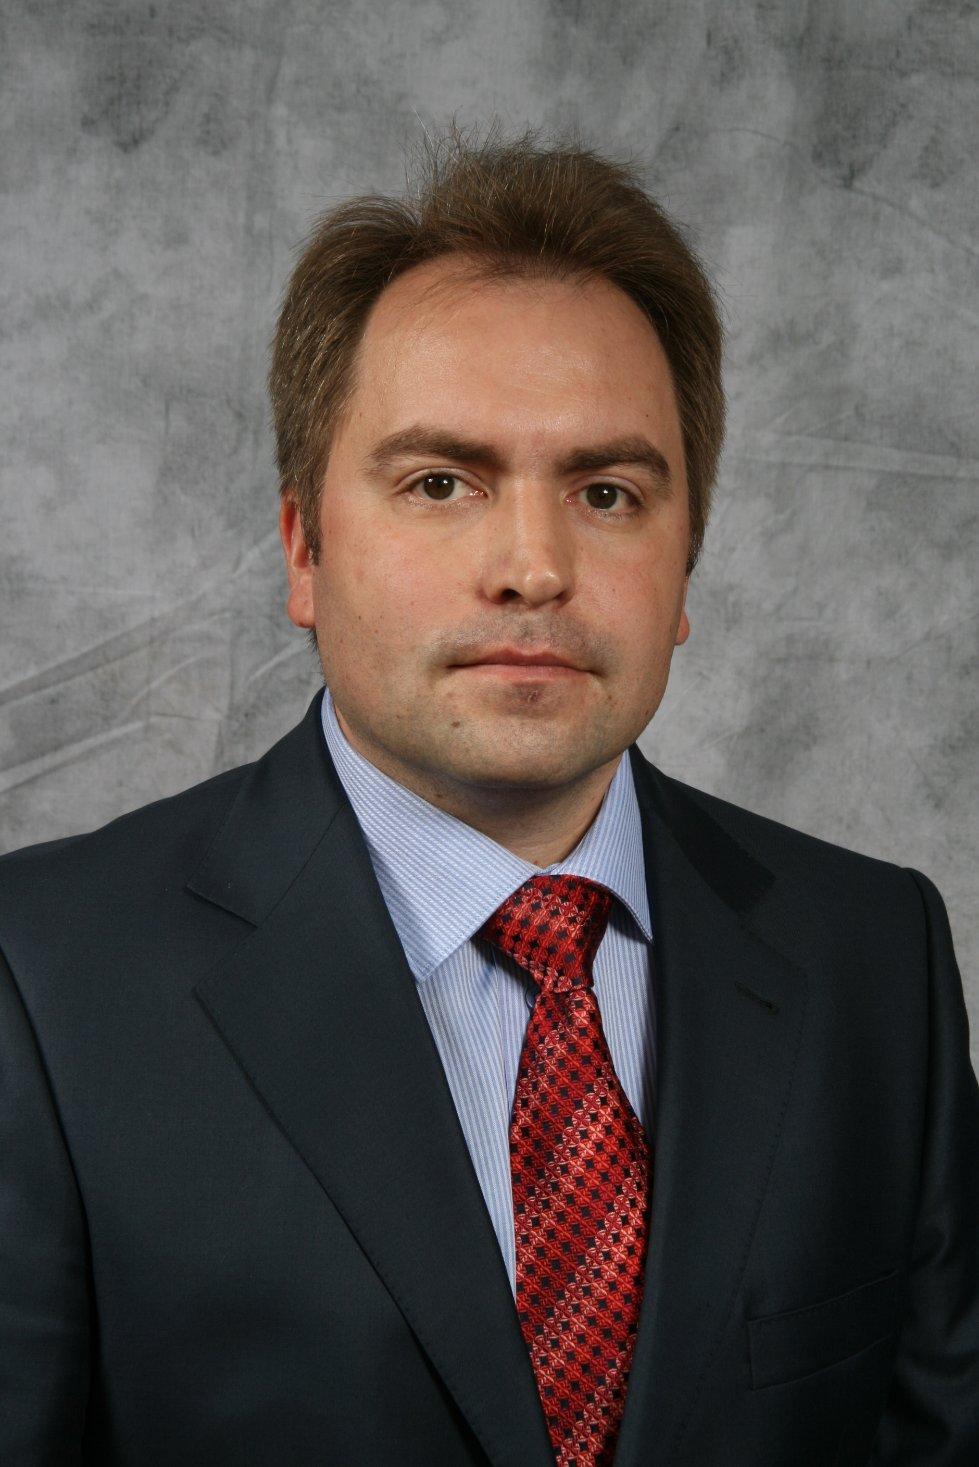 Туфетулов Айдар Миралимович